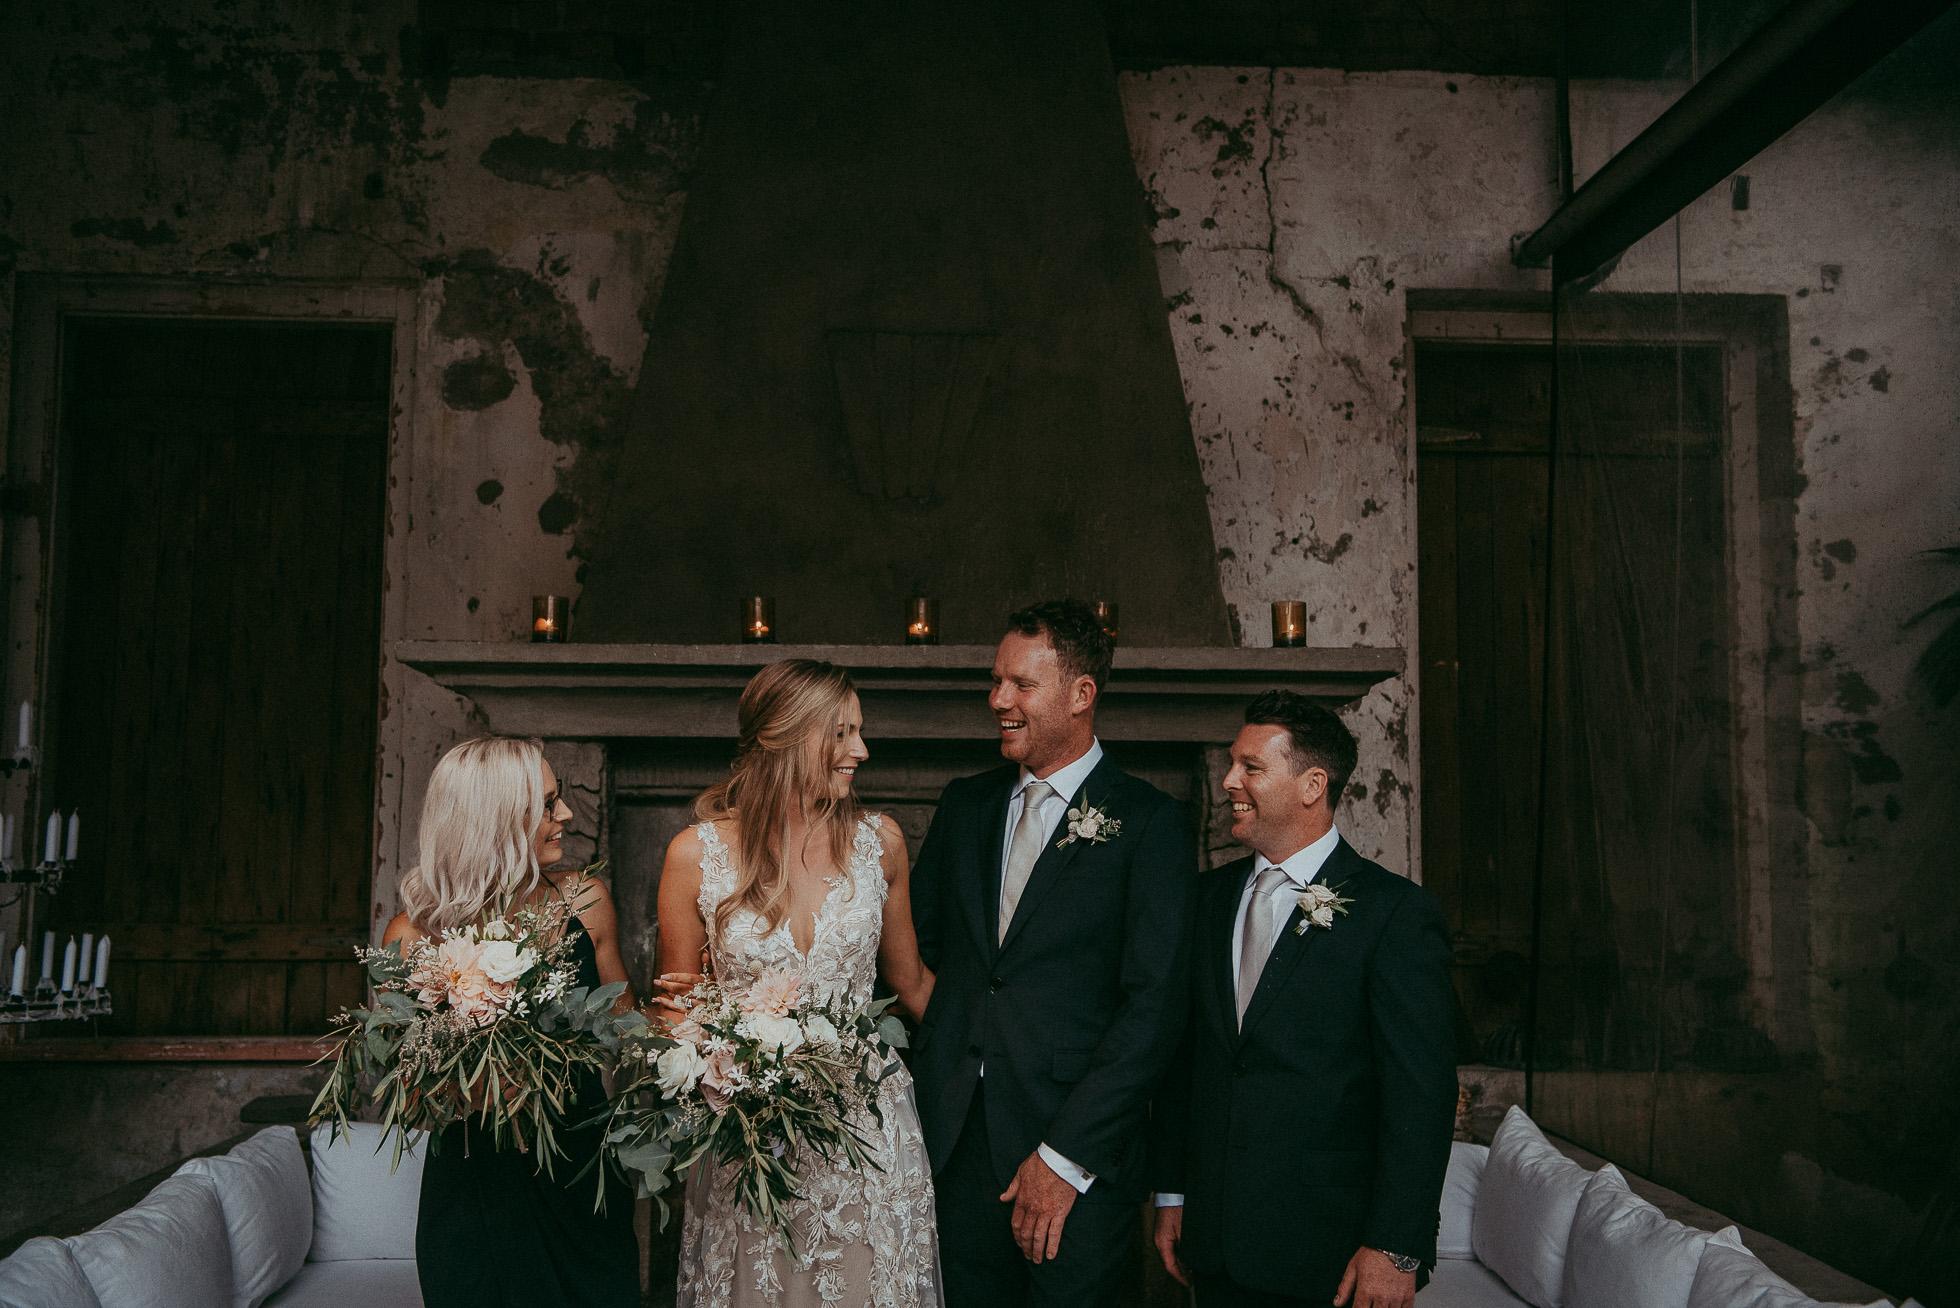 wedding-by-levien-331.JPG